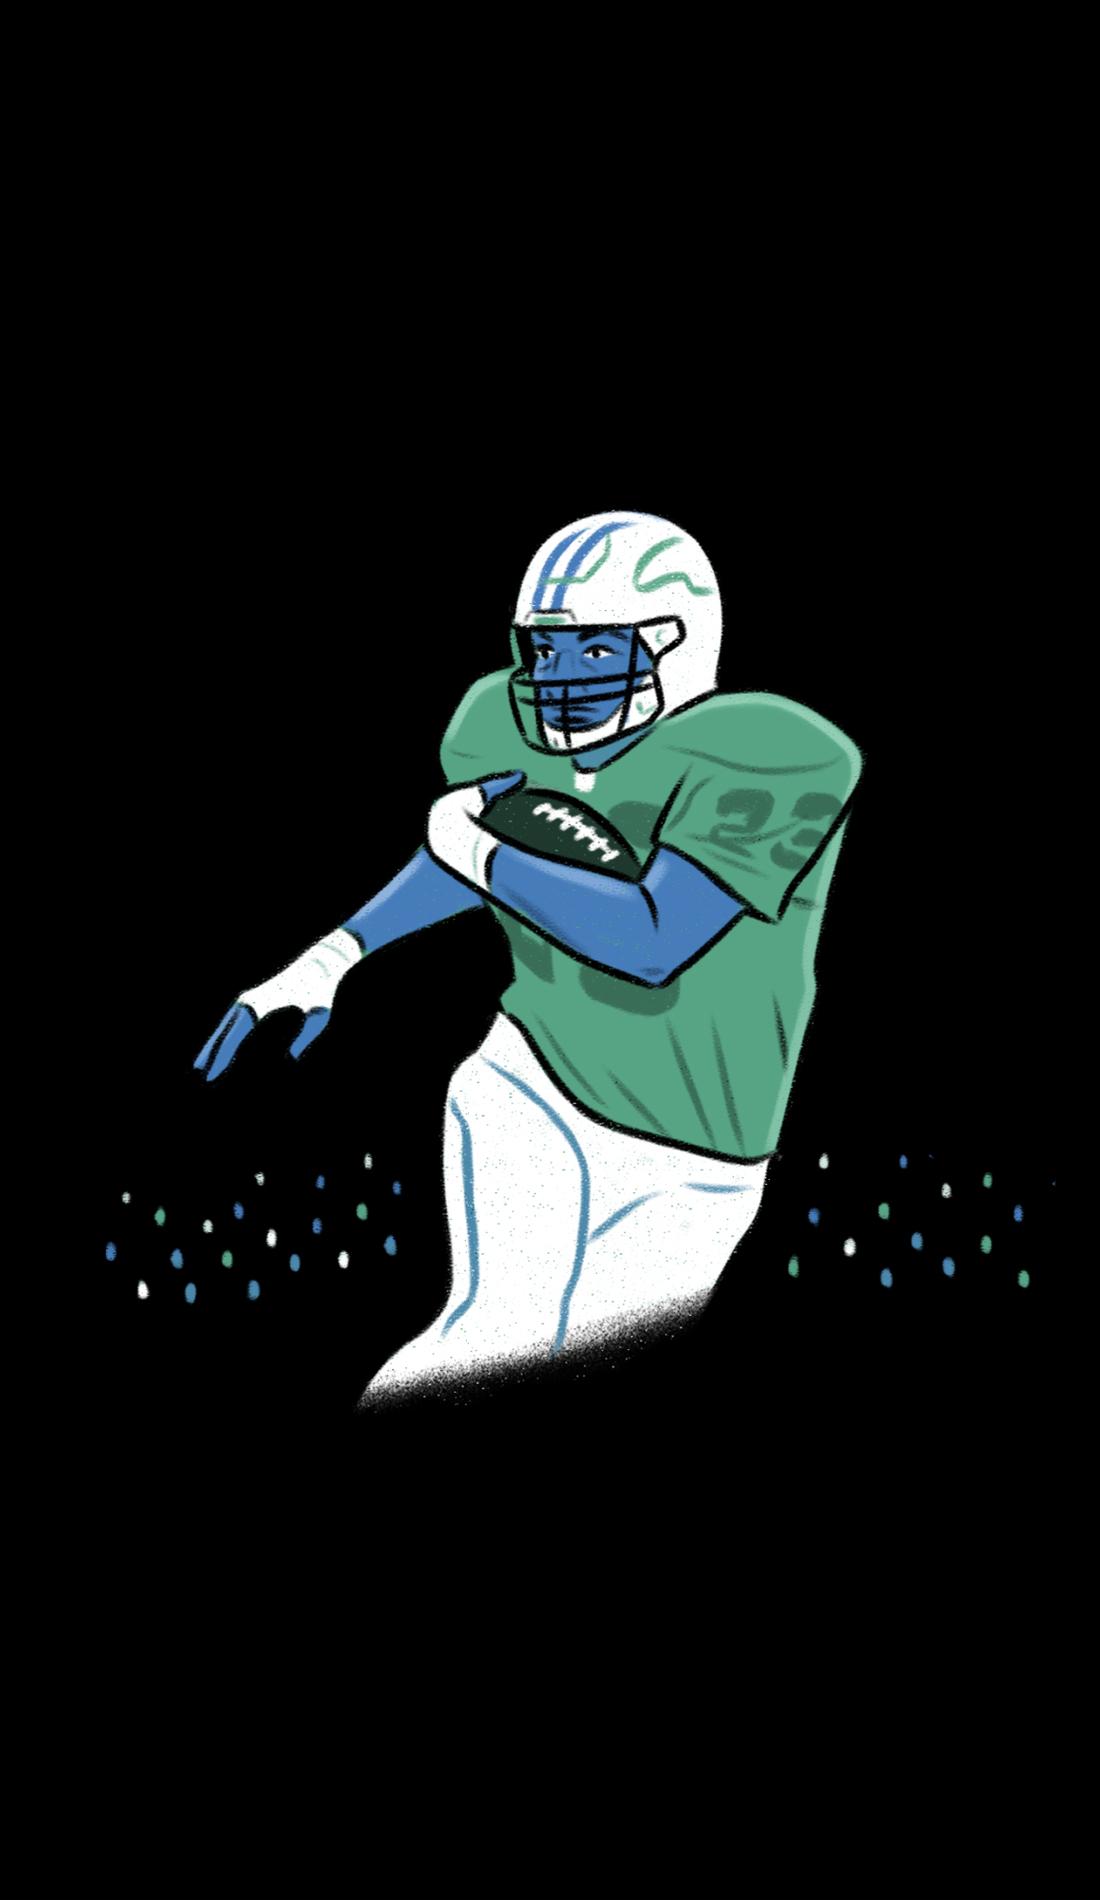 A South Alabama Jaguars Football live event